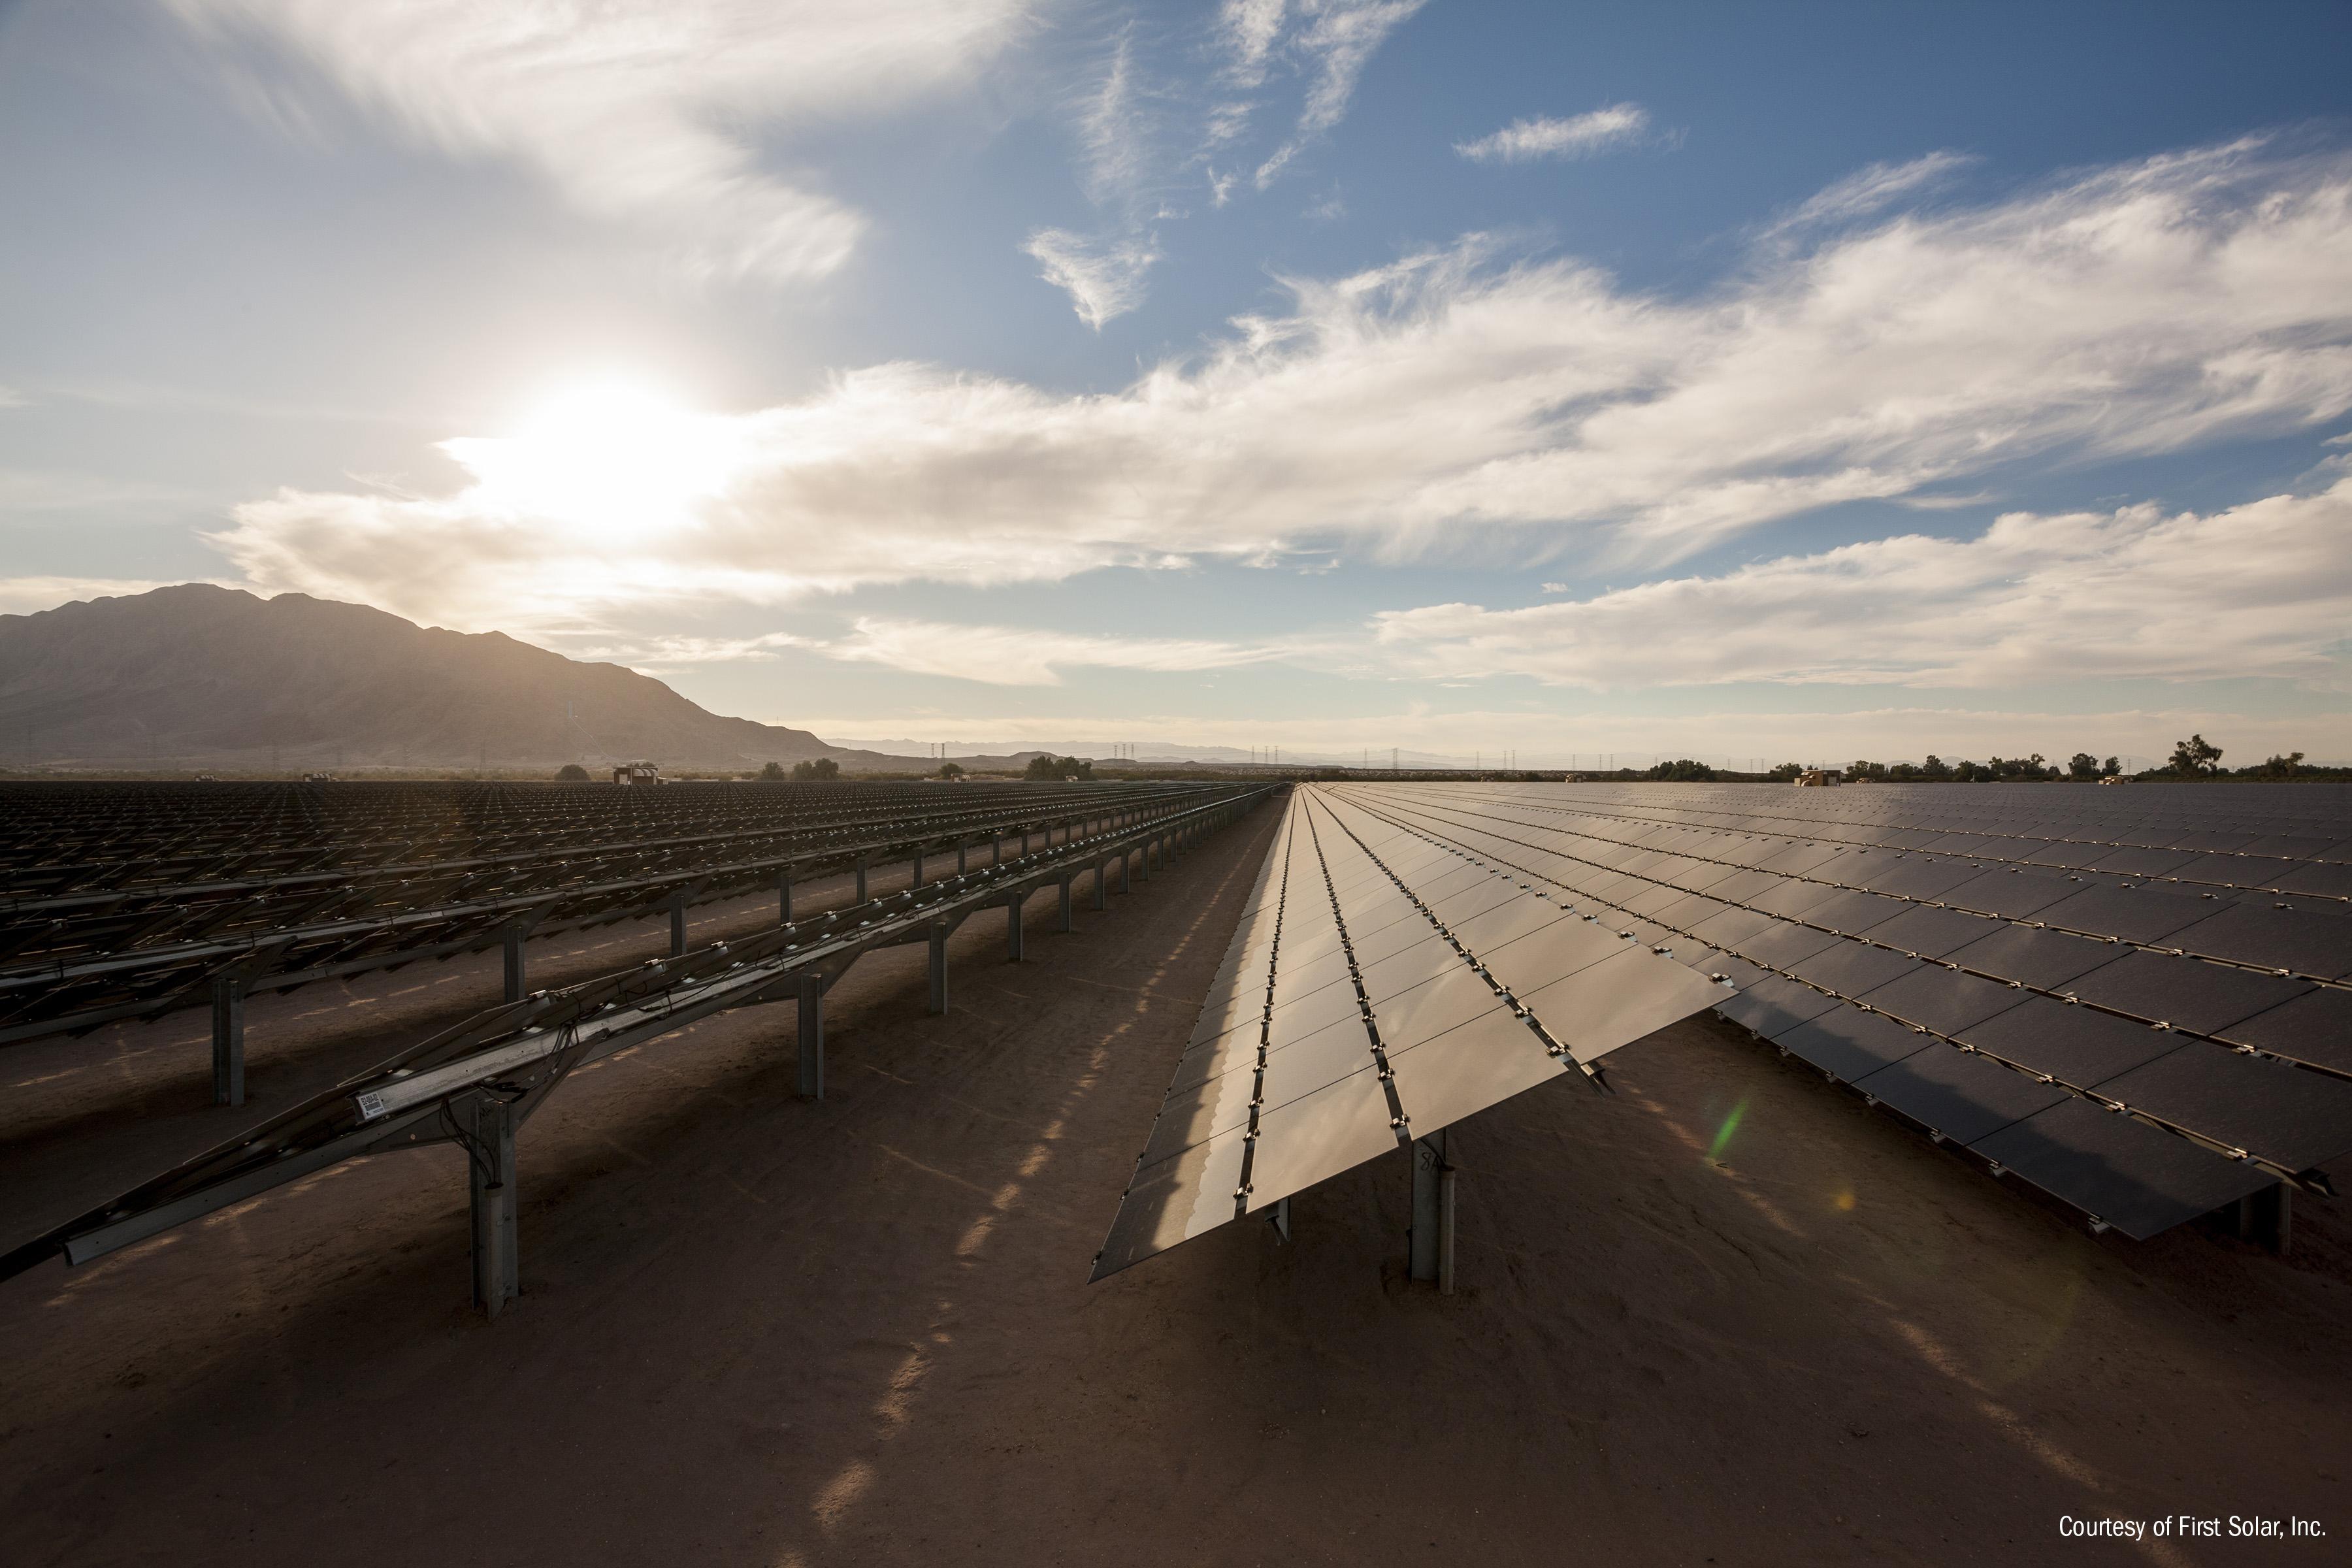 First Solar power plant in the desert.